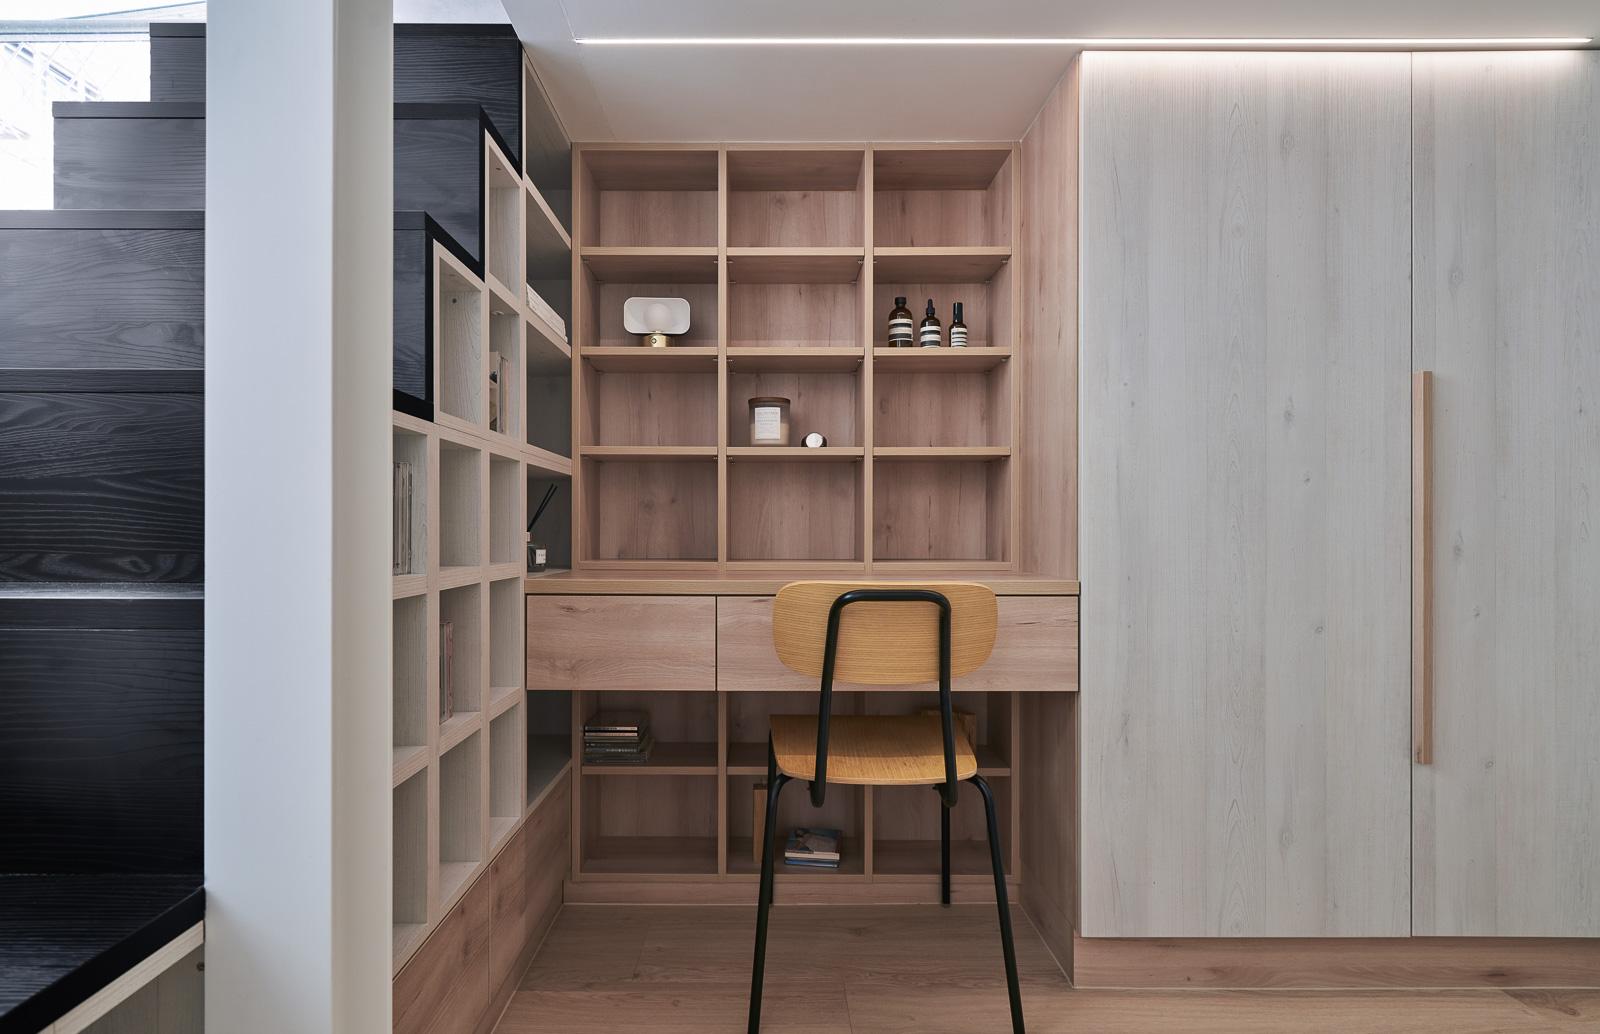 NestSpace_SmallHouse_S-215